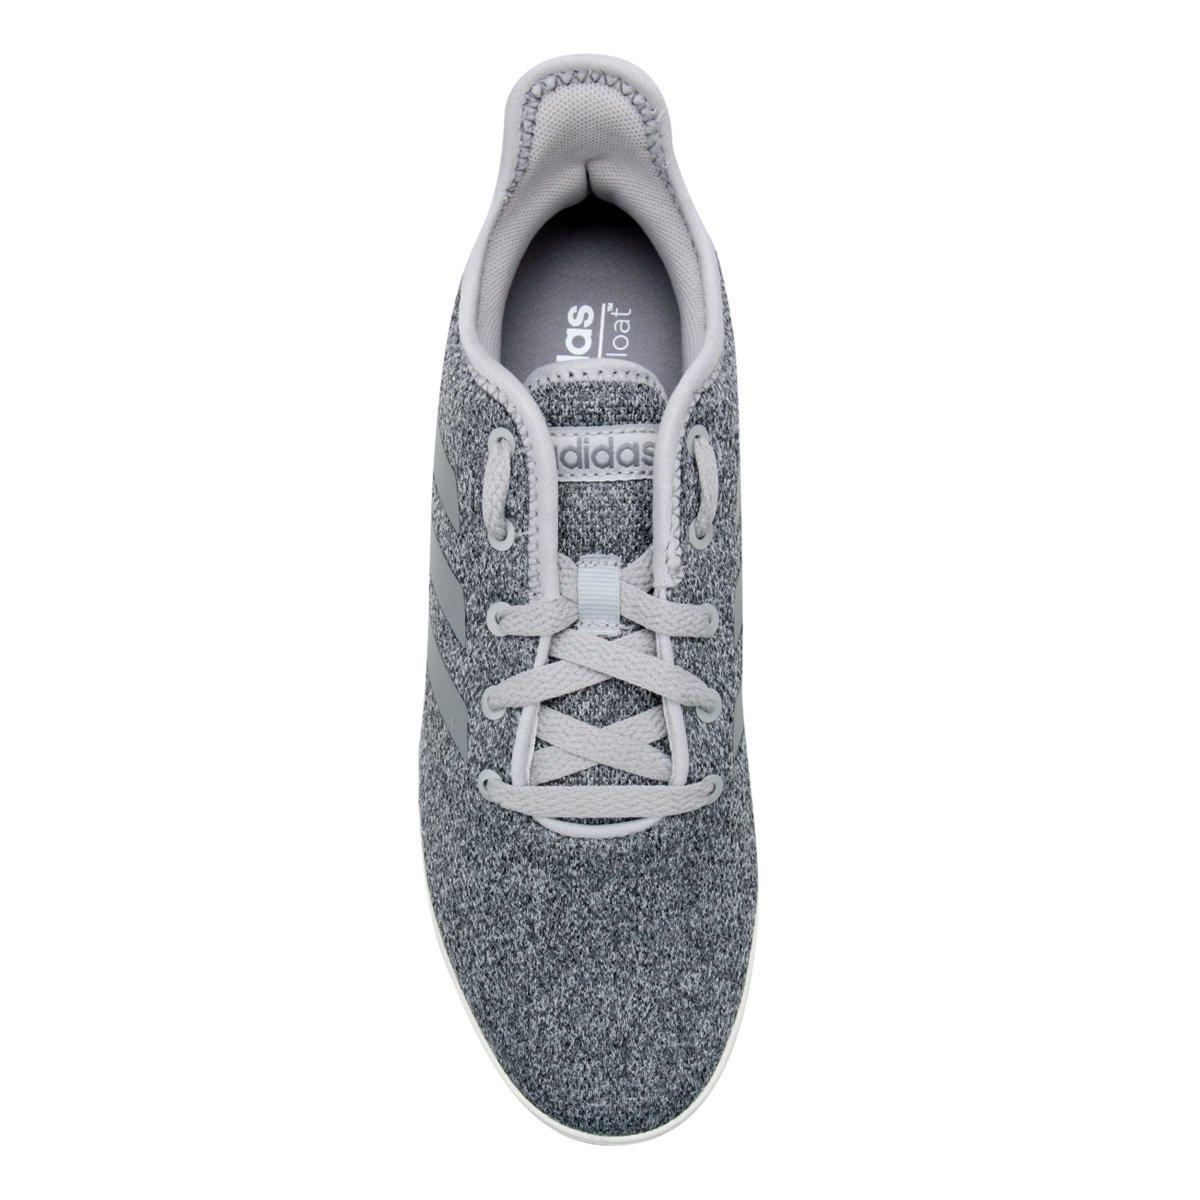 Masculino Adidas e Tênis Adidas Tênis Branco Cinza Defy 4qPWxIg